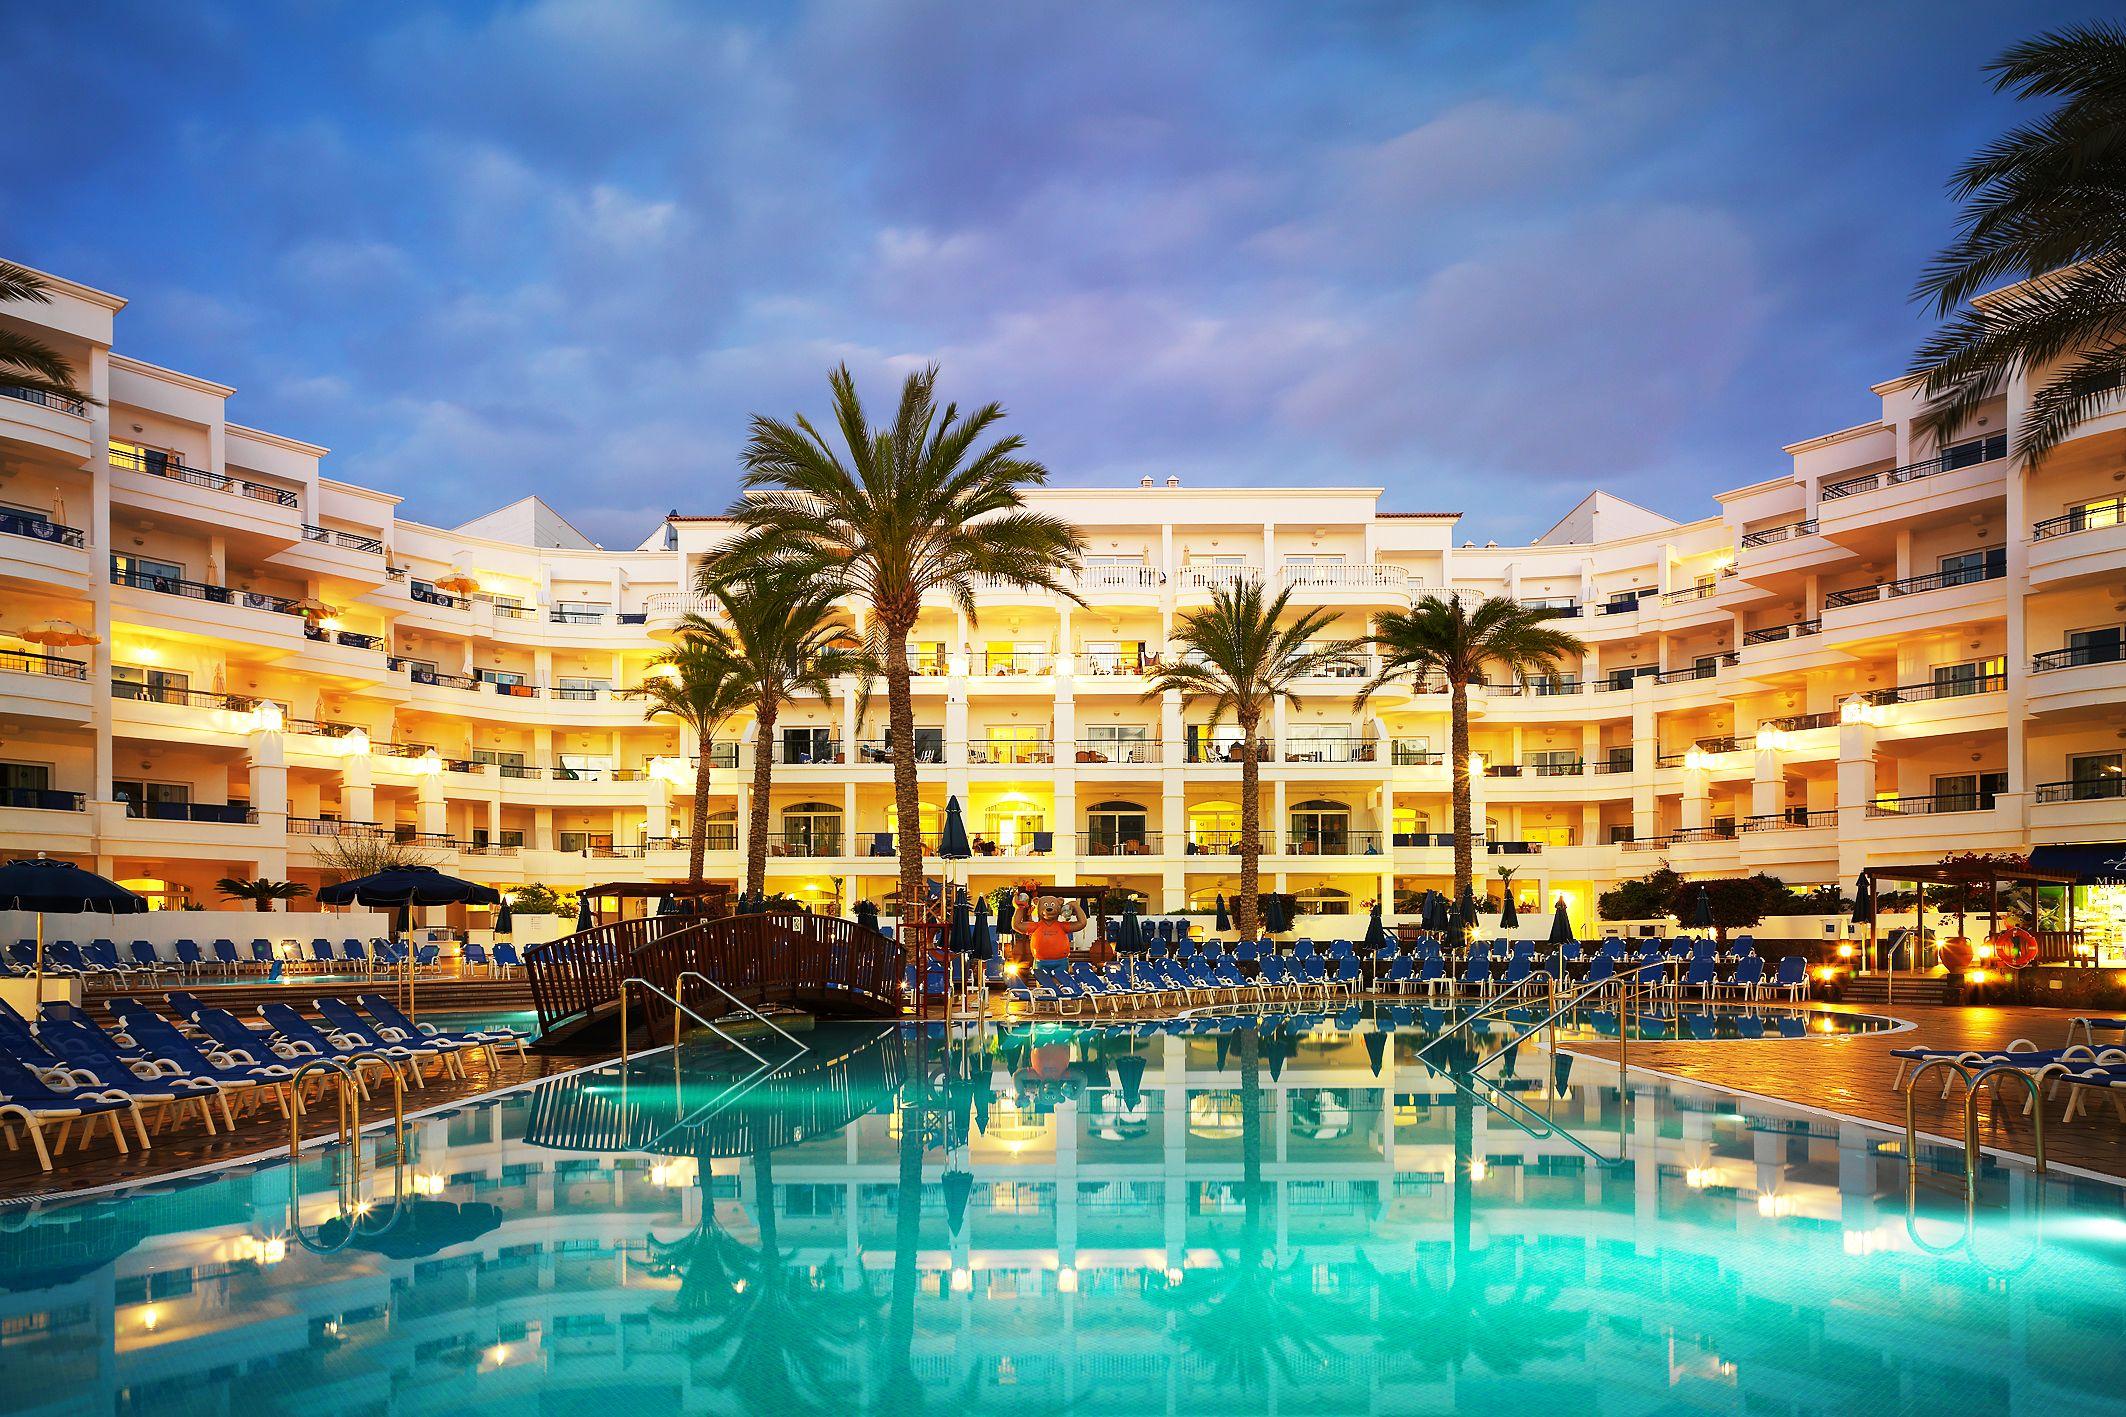 Sunwing Resort Fanabe, Tenerife Sunwing Resort